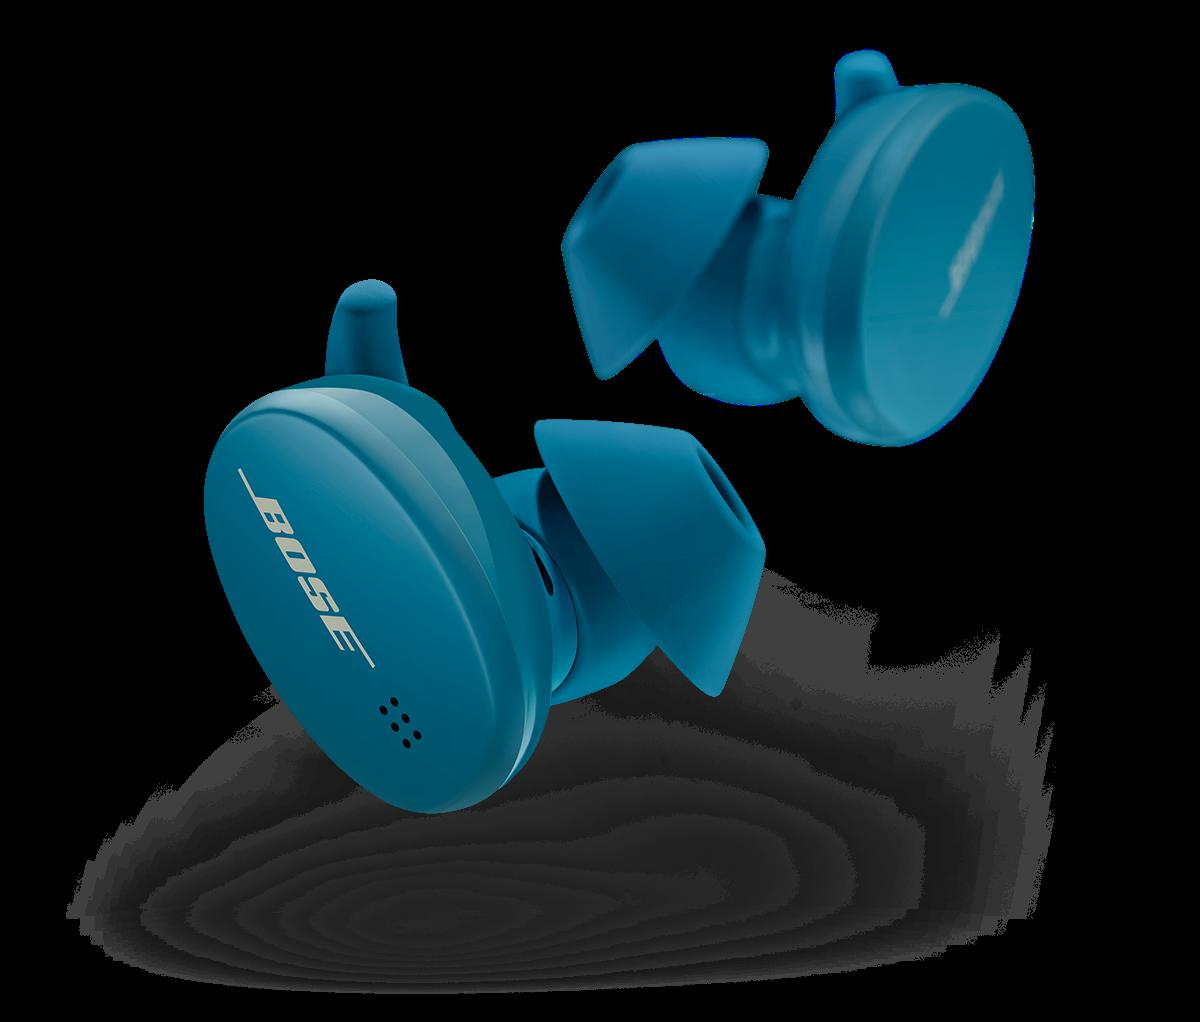 Bose Sport Earbuds Baltic Blue 805746-0020